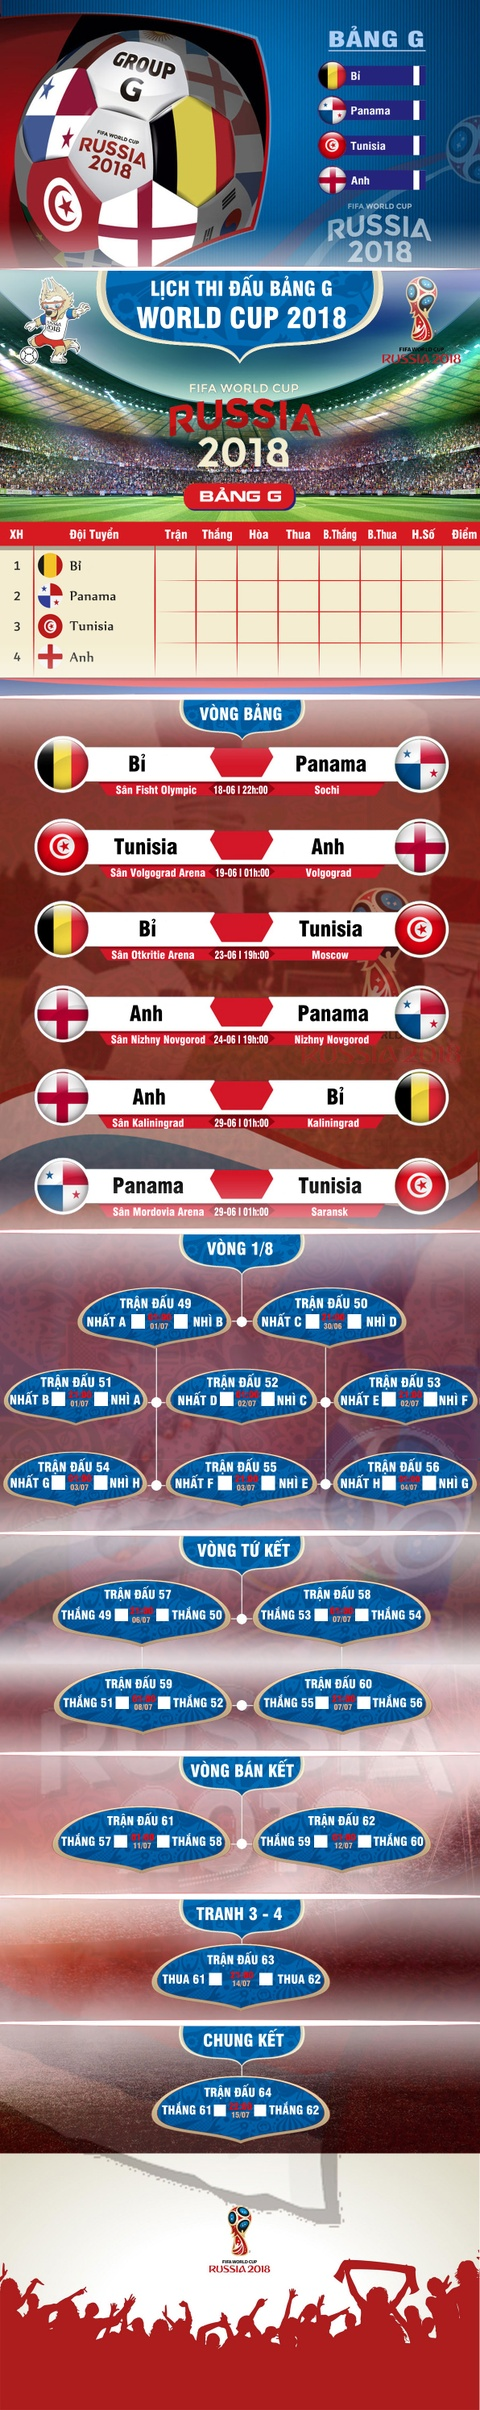 Lich thi dau bang G o World Cup 2018: Dai chien giua DT Anh va DT Bi hinh anh 1